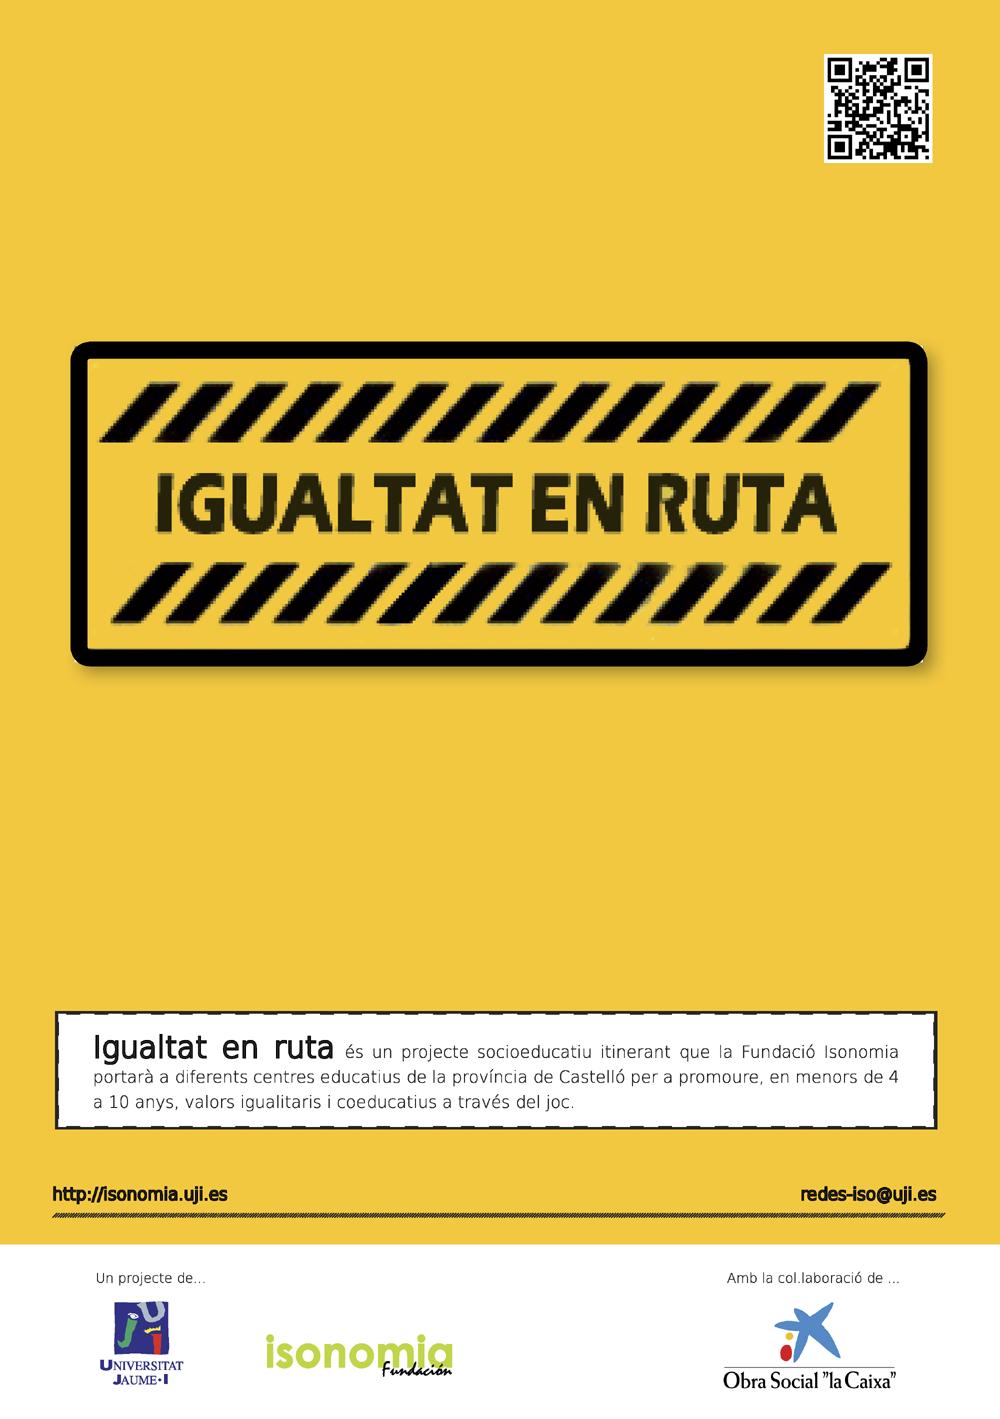 Imagen-cartel-igualtat-ruta